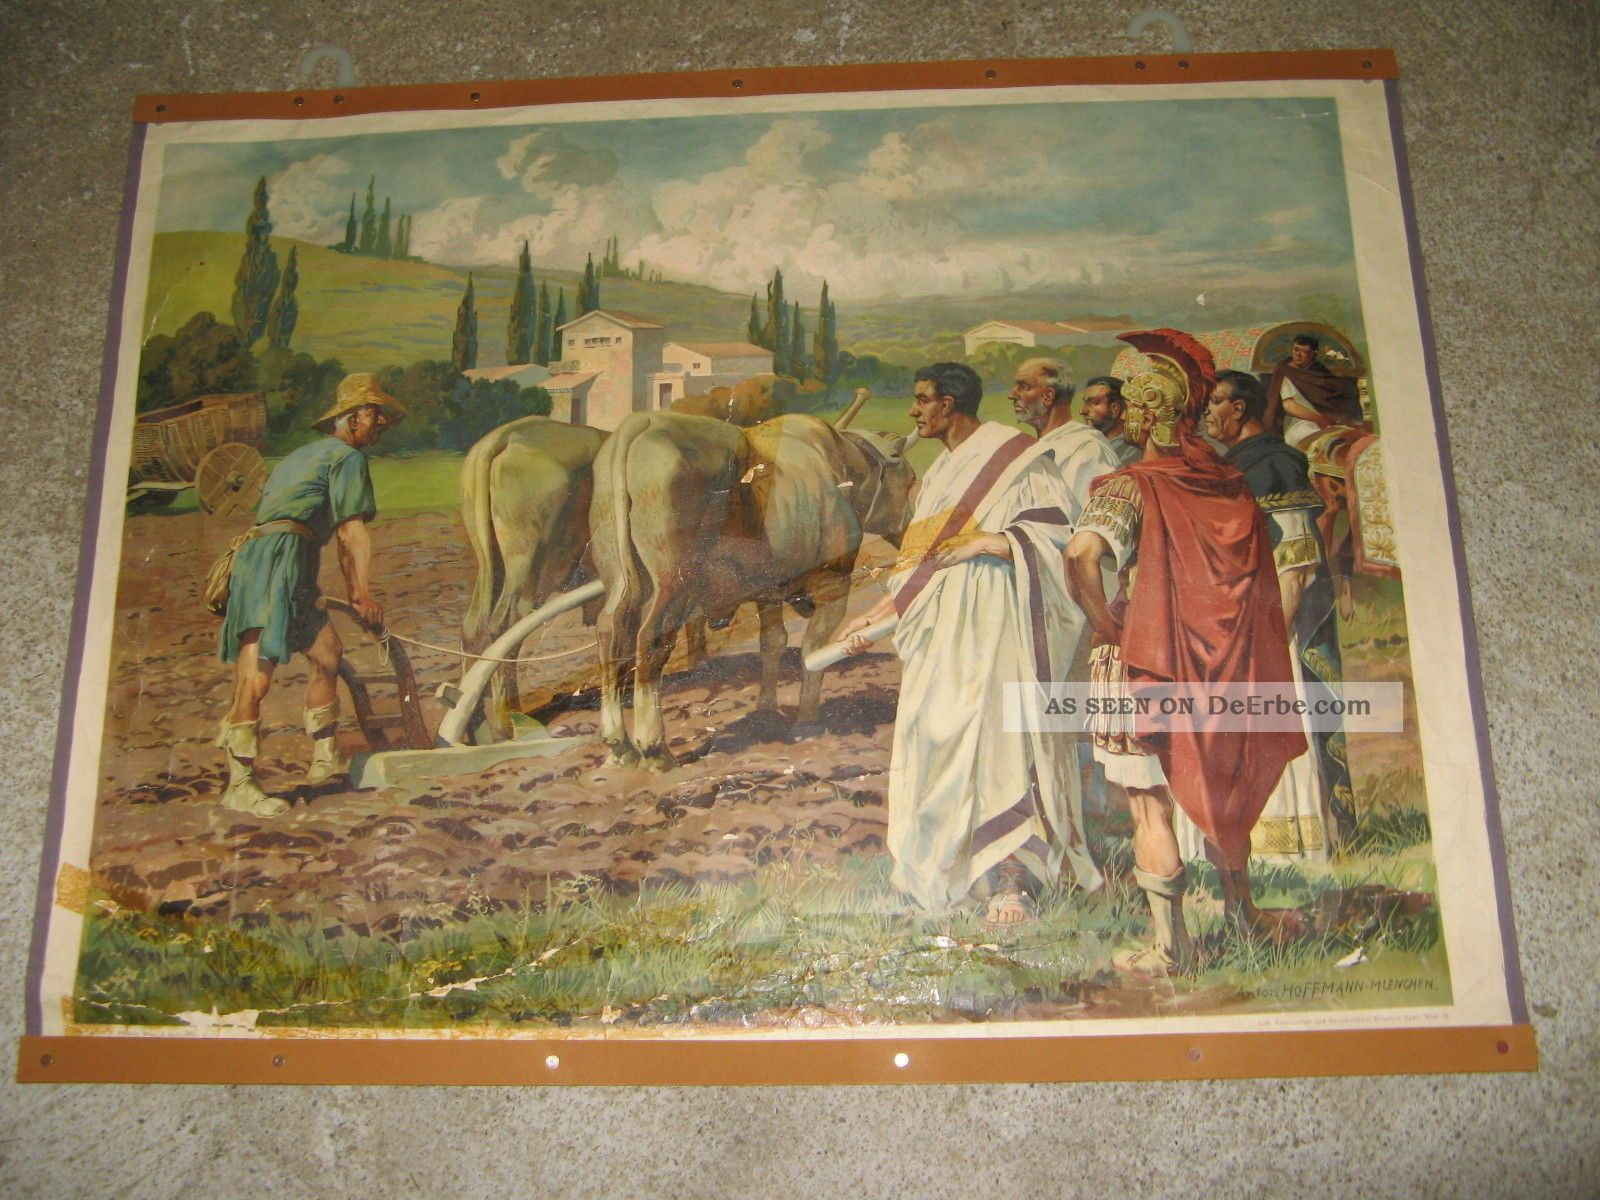 2 Alte Schautafeln,  Wandbilde/ Das Leben Der Römer Antike Bild